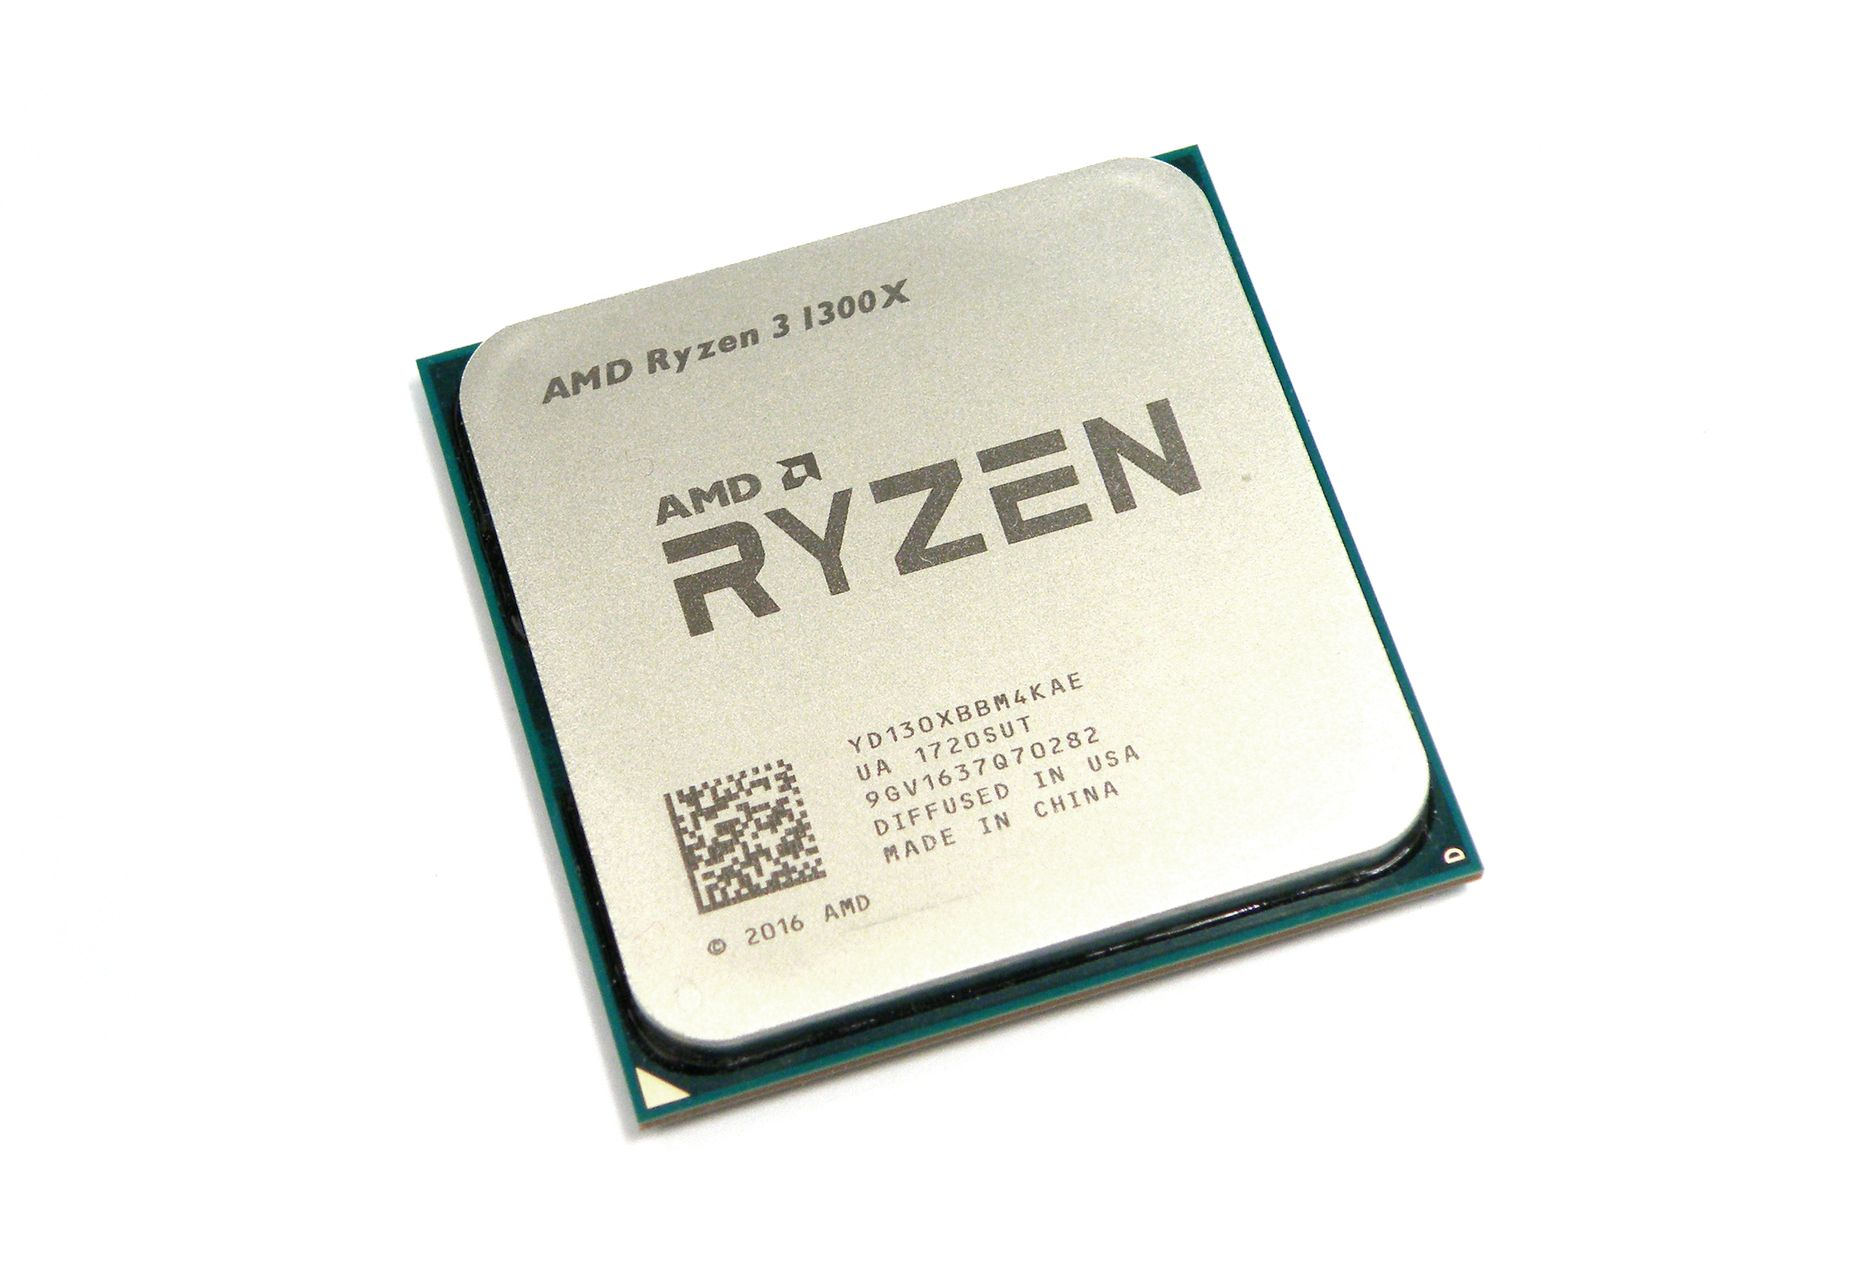 AMD Ryzen 3 1300X procesor